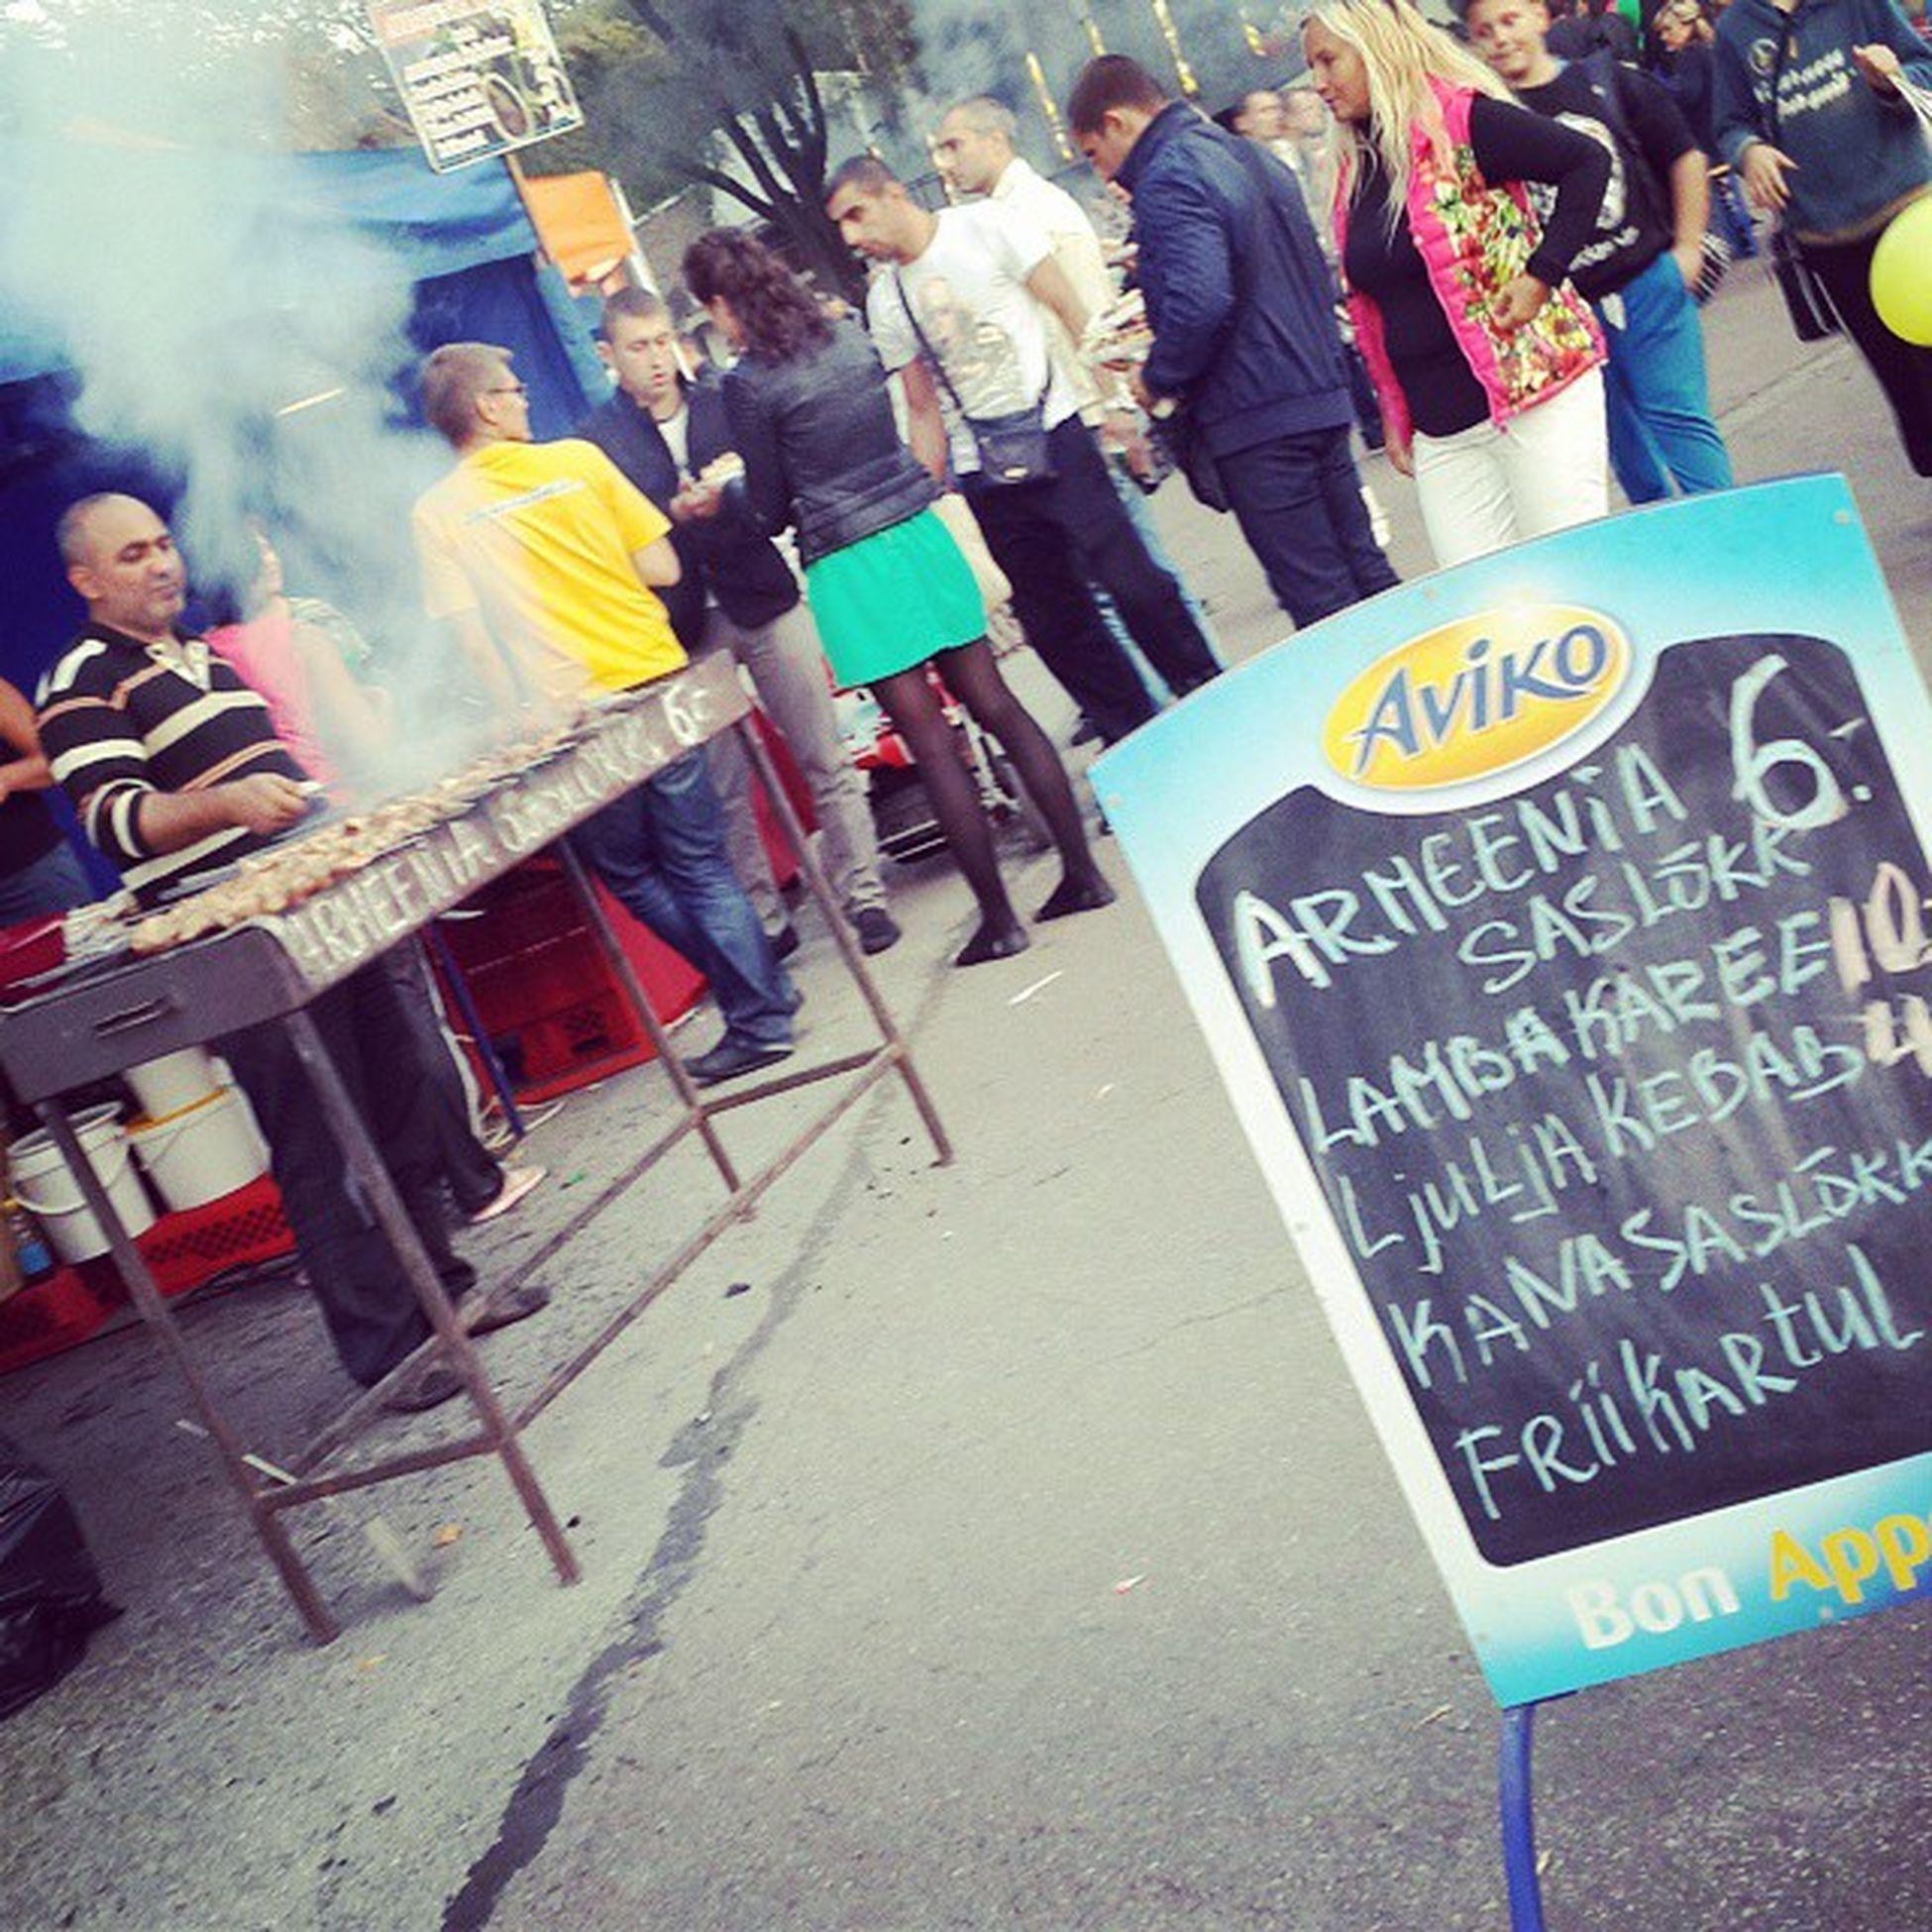 ArmanianDelight Barbeque Sashlokki Lovekoto Yummy MustToTry TallinnEstonia